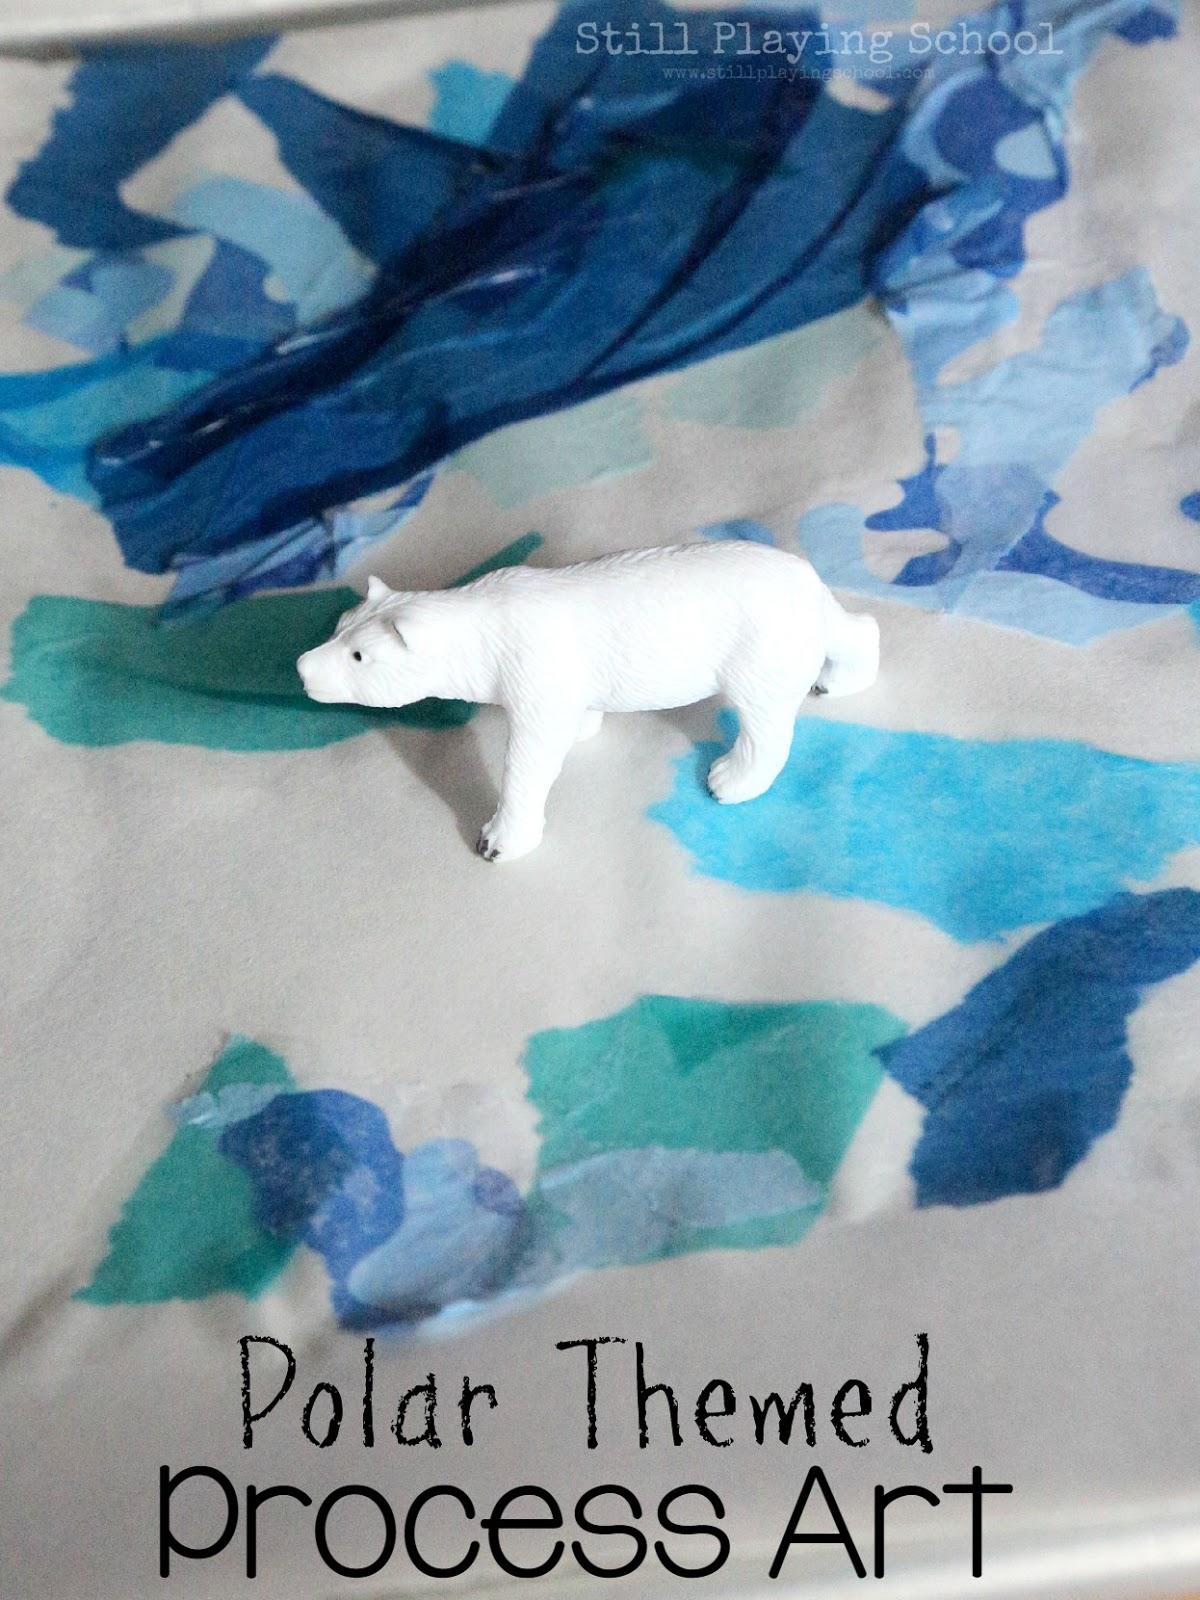 Polar Themed Process Art For Kids